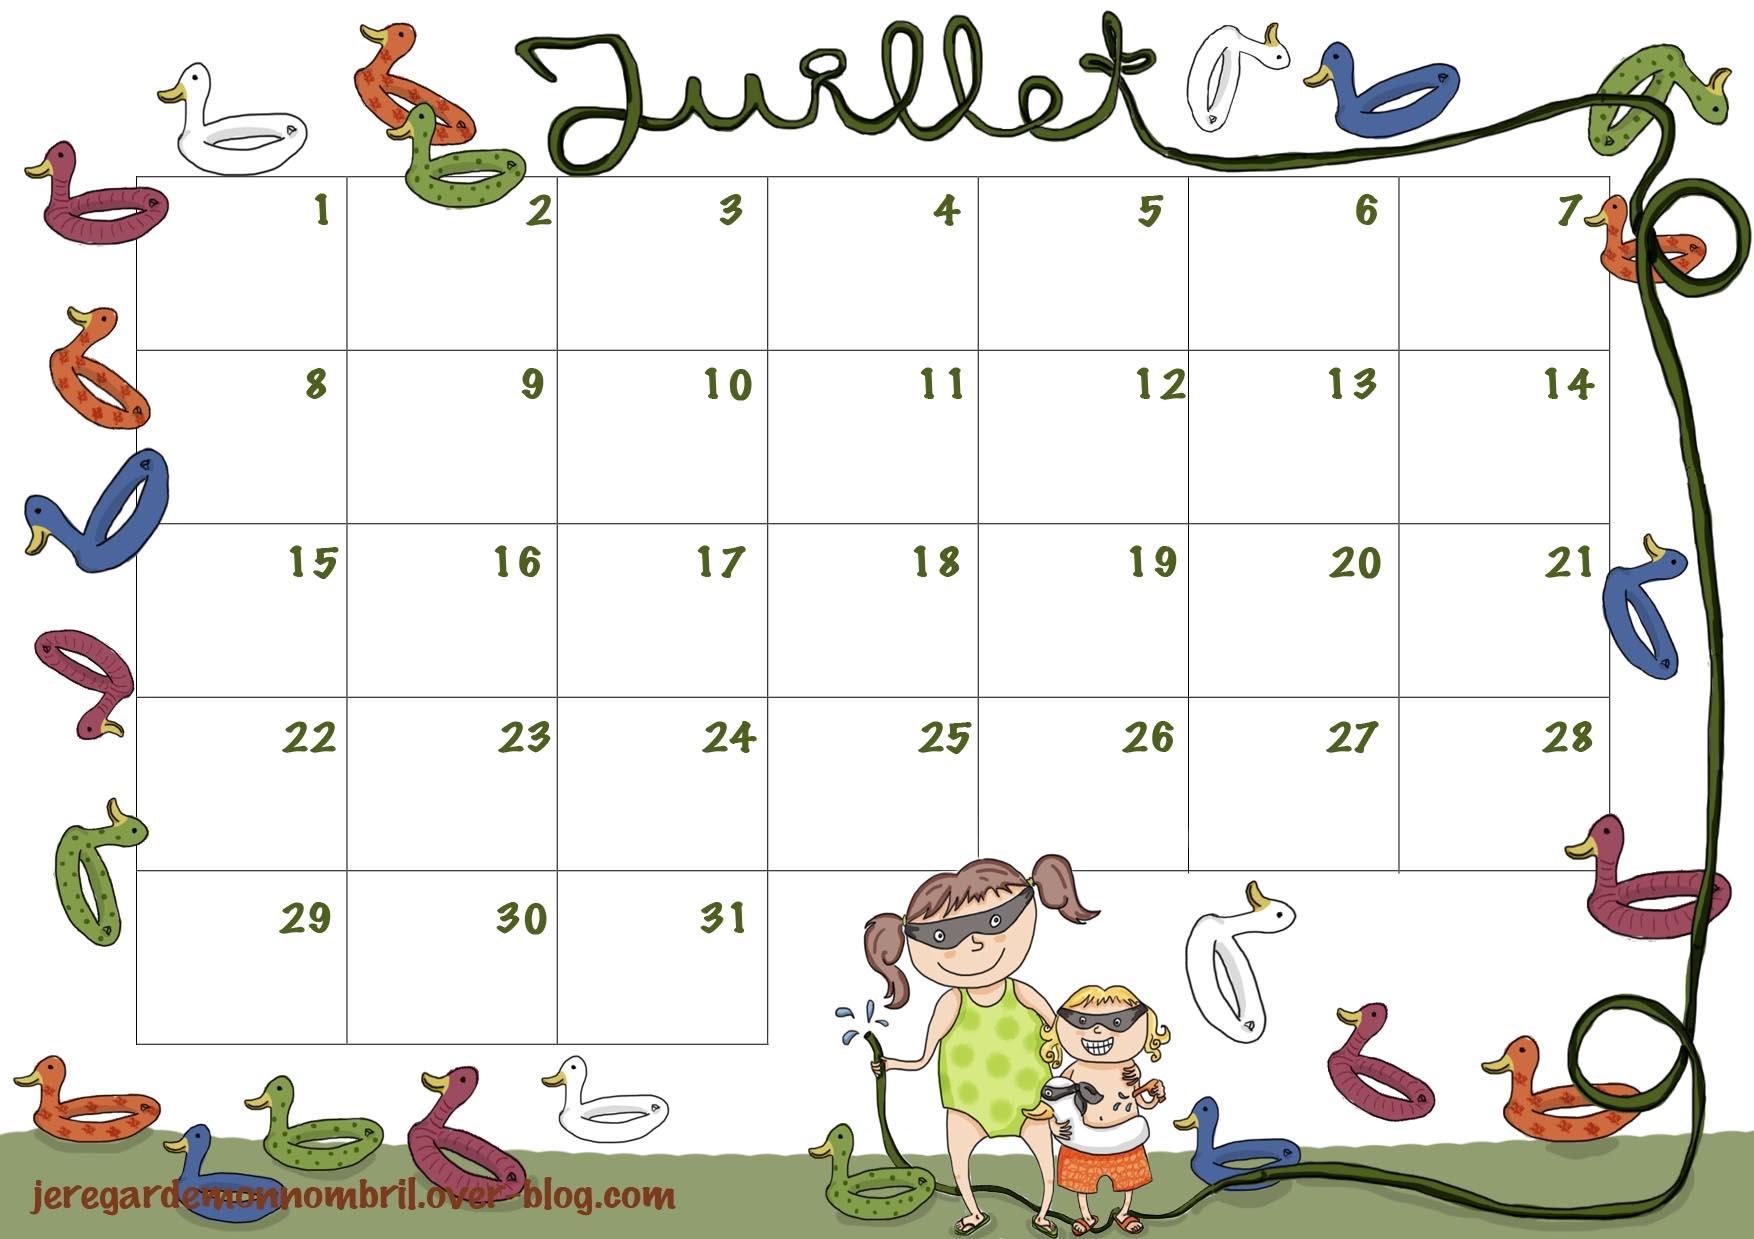 http://emmiroelmelic.free.fr/dessins/juillet13.jpg